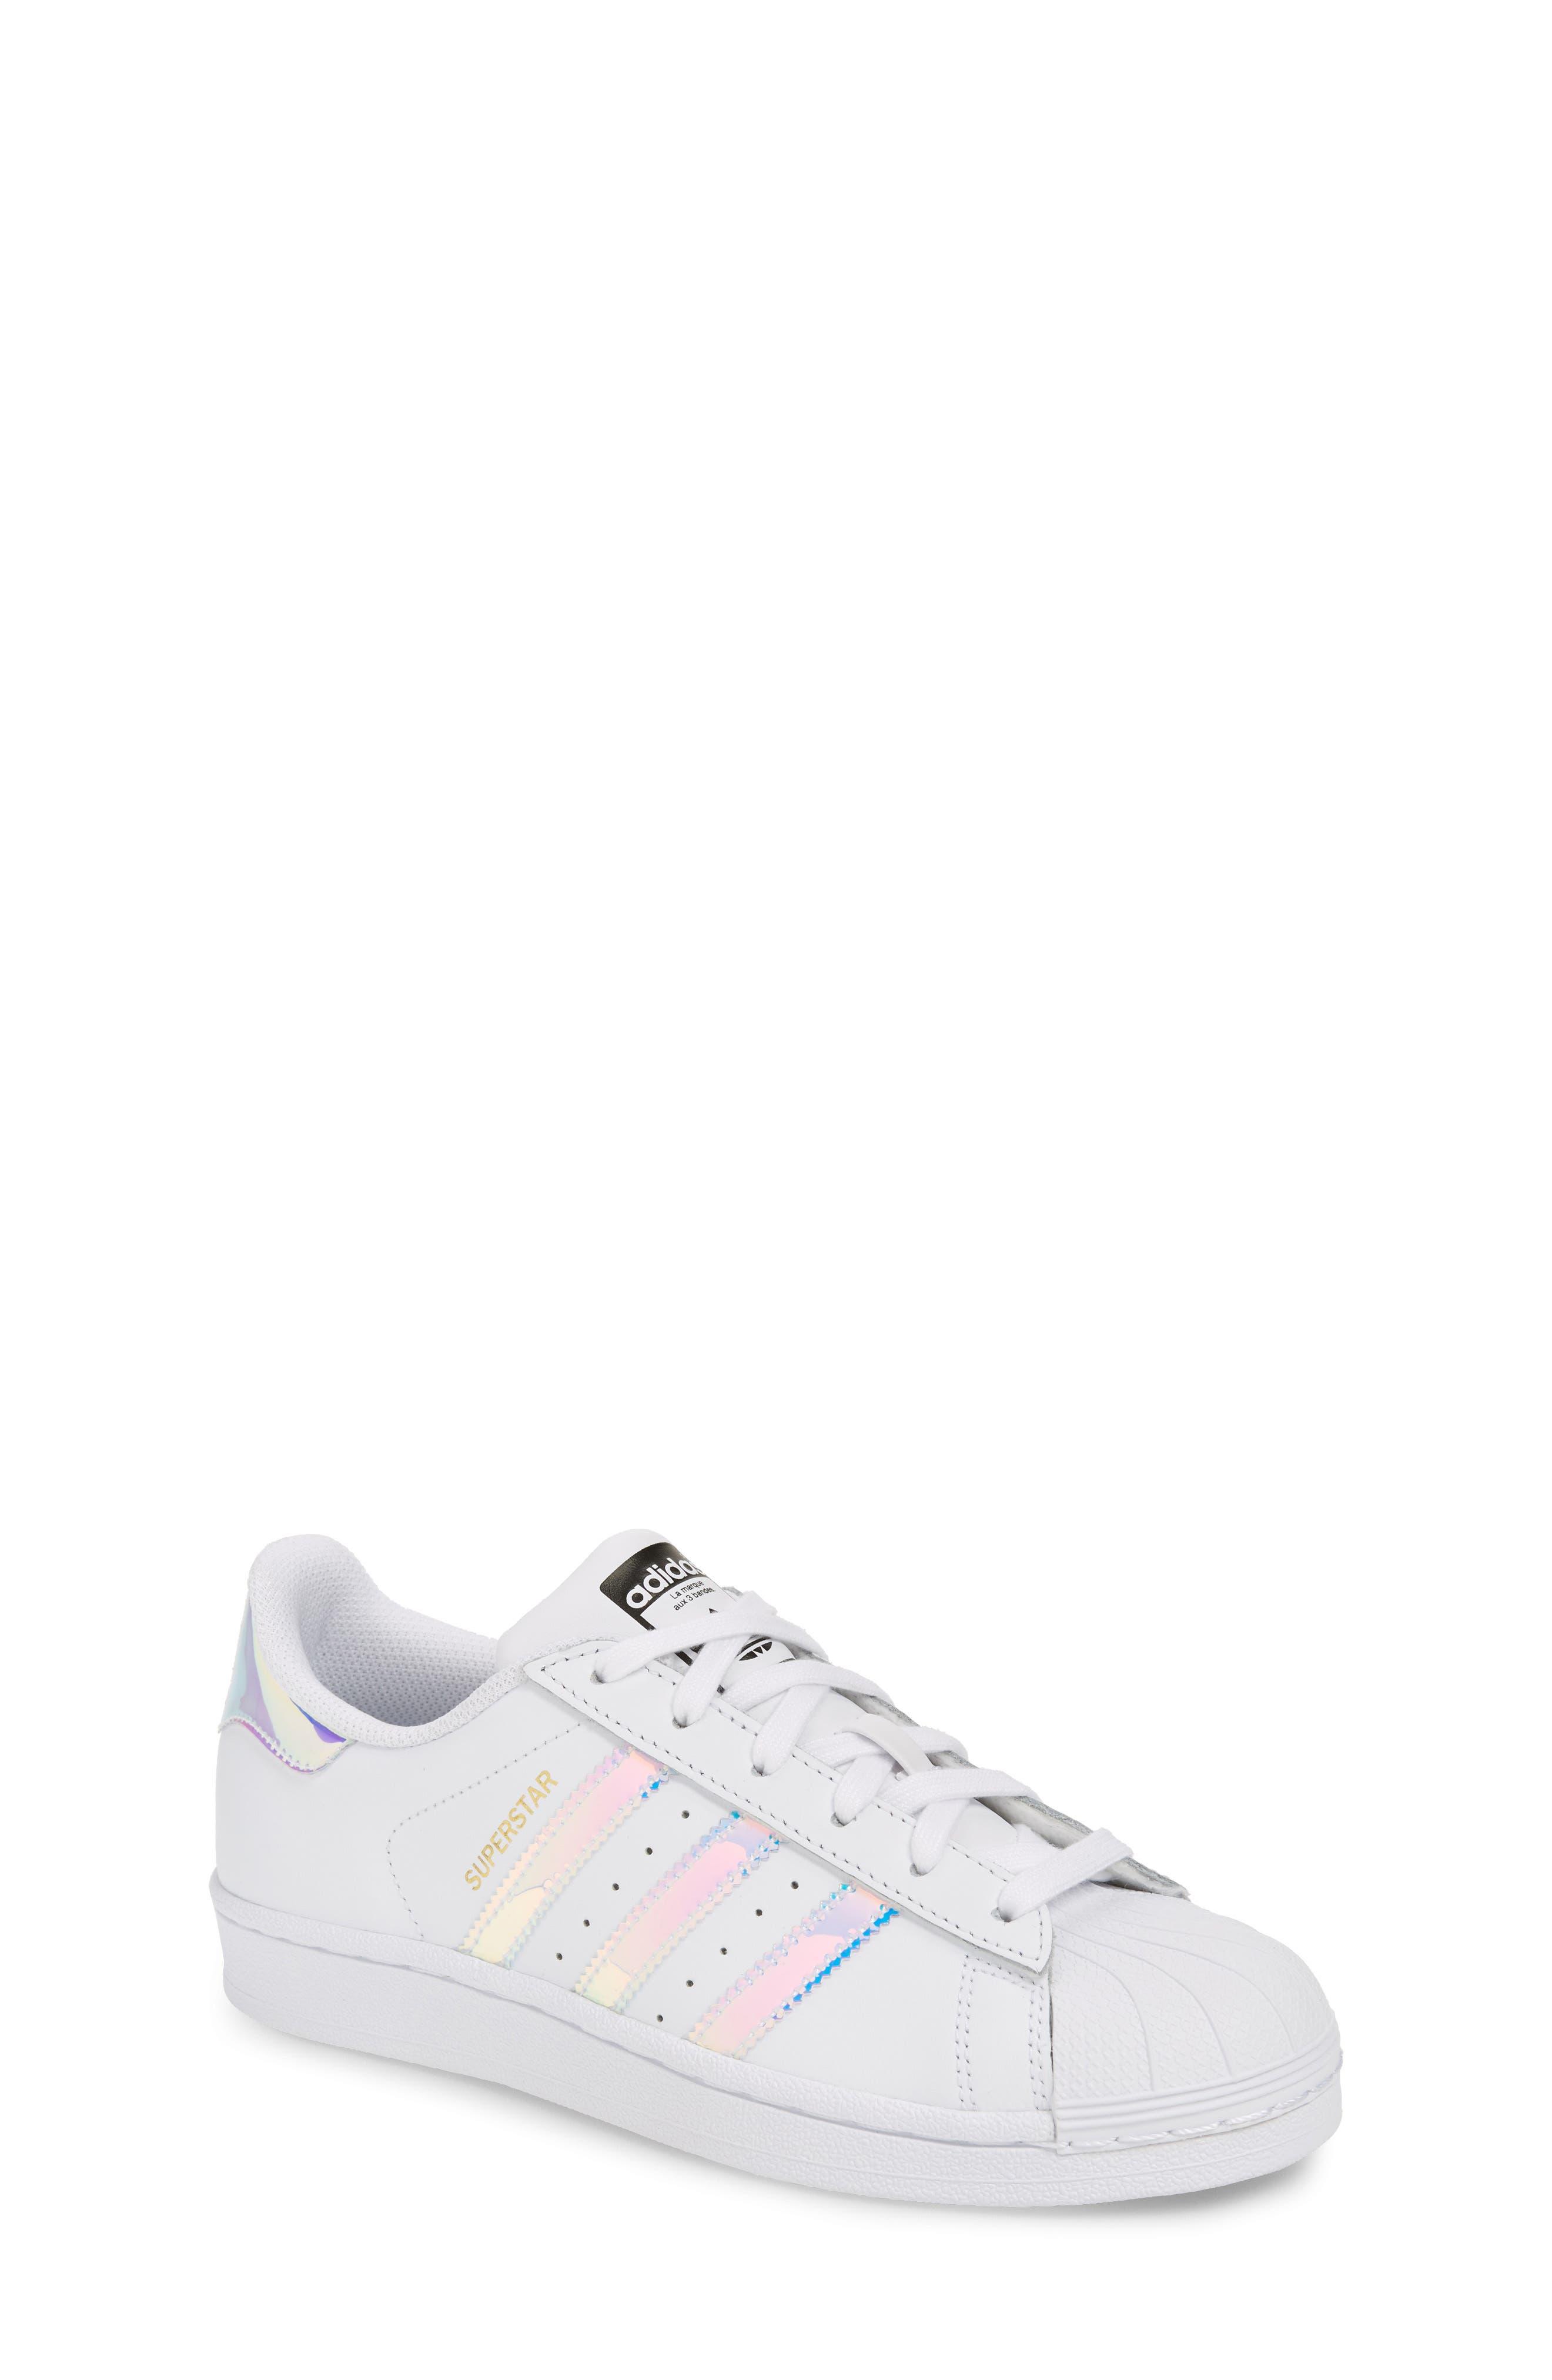 adidas superstar iridescent size 2